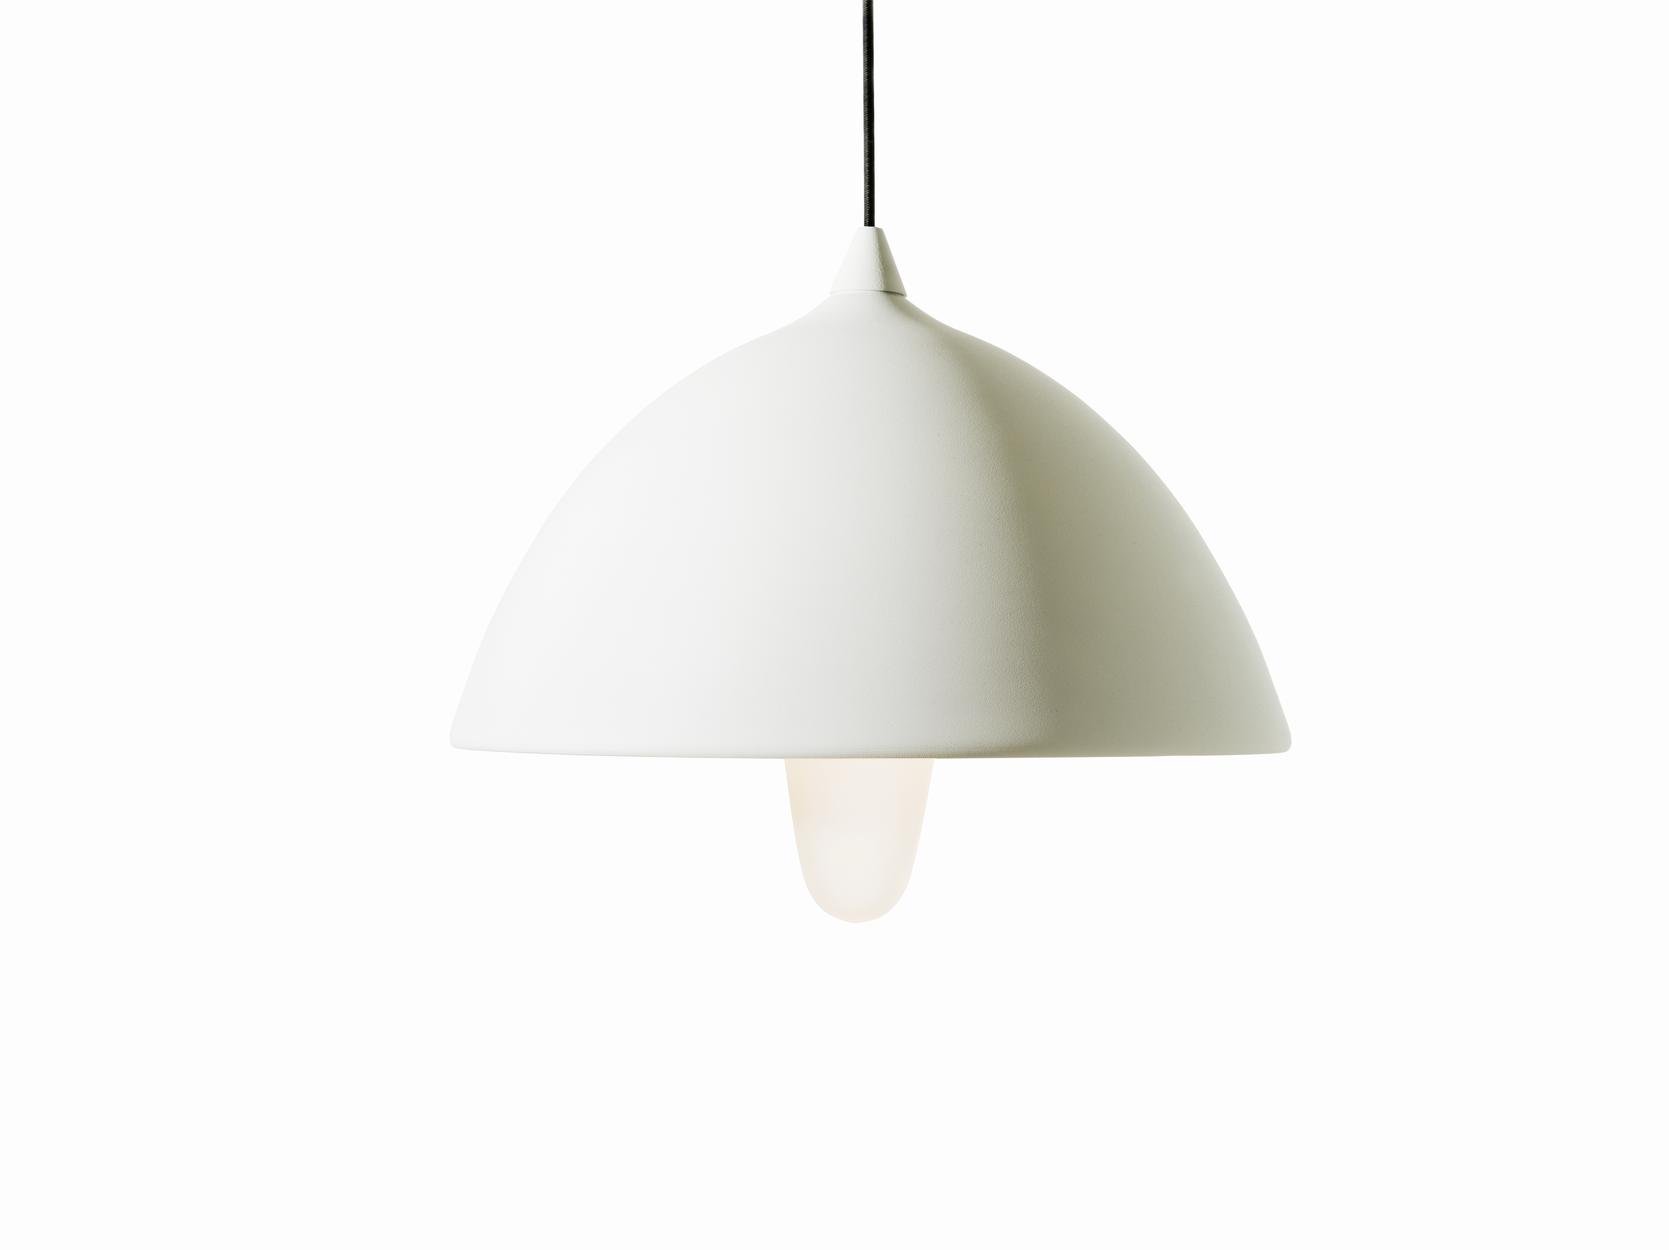 Functionals Hanglamp Aron 401 Wit Pendant White Gimmii Online Shop